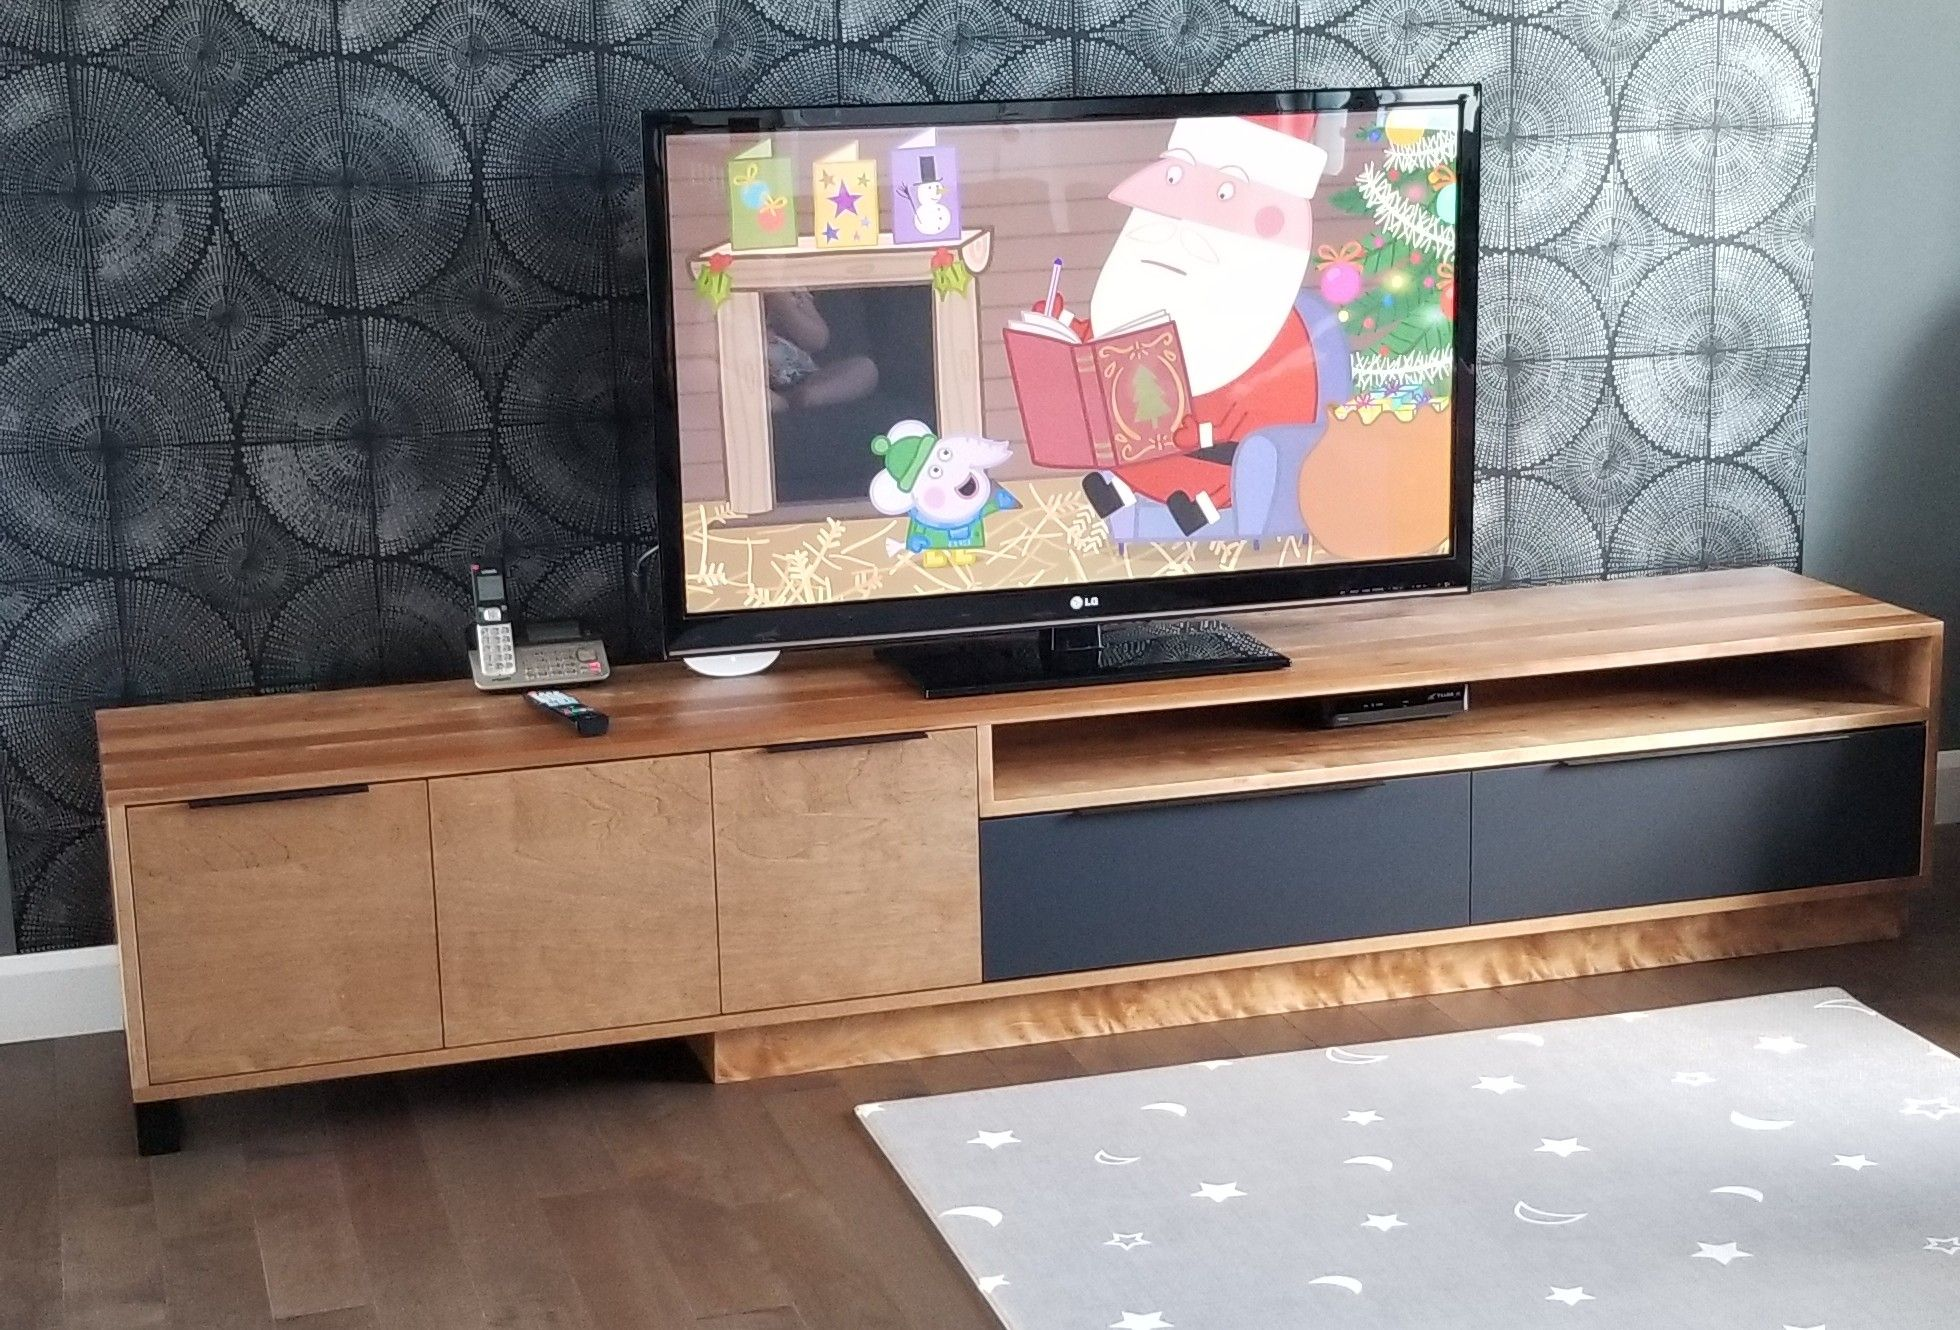 Meuble Tele Montcalm Merisier Surmesure Lusine Meubletele Merisier Montcalm In 2020 Electronic Products Flat Screen Tv